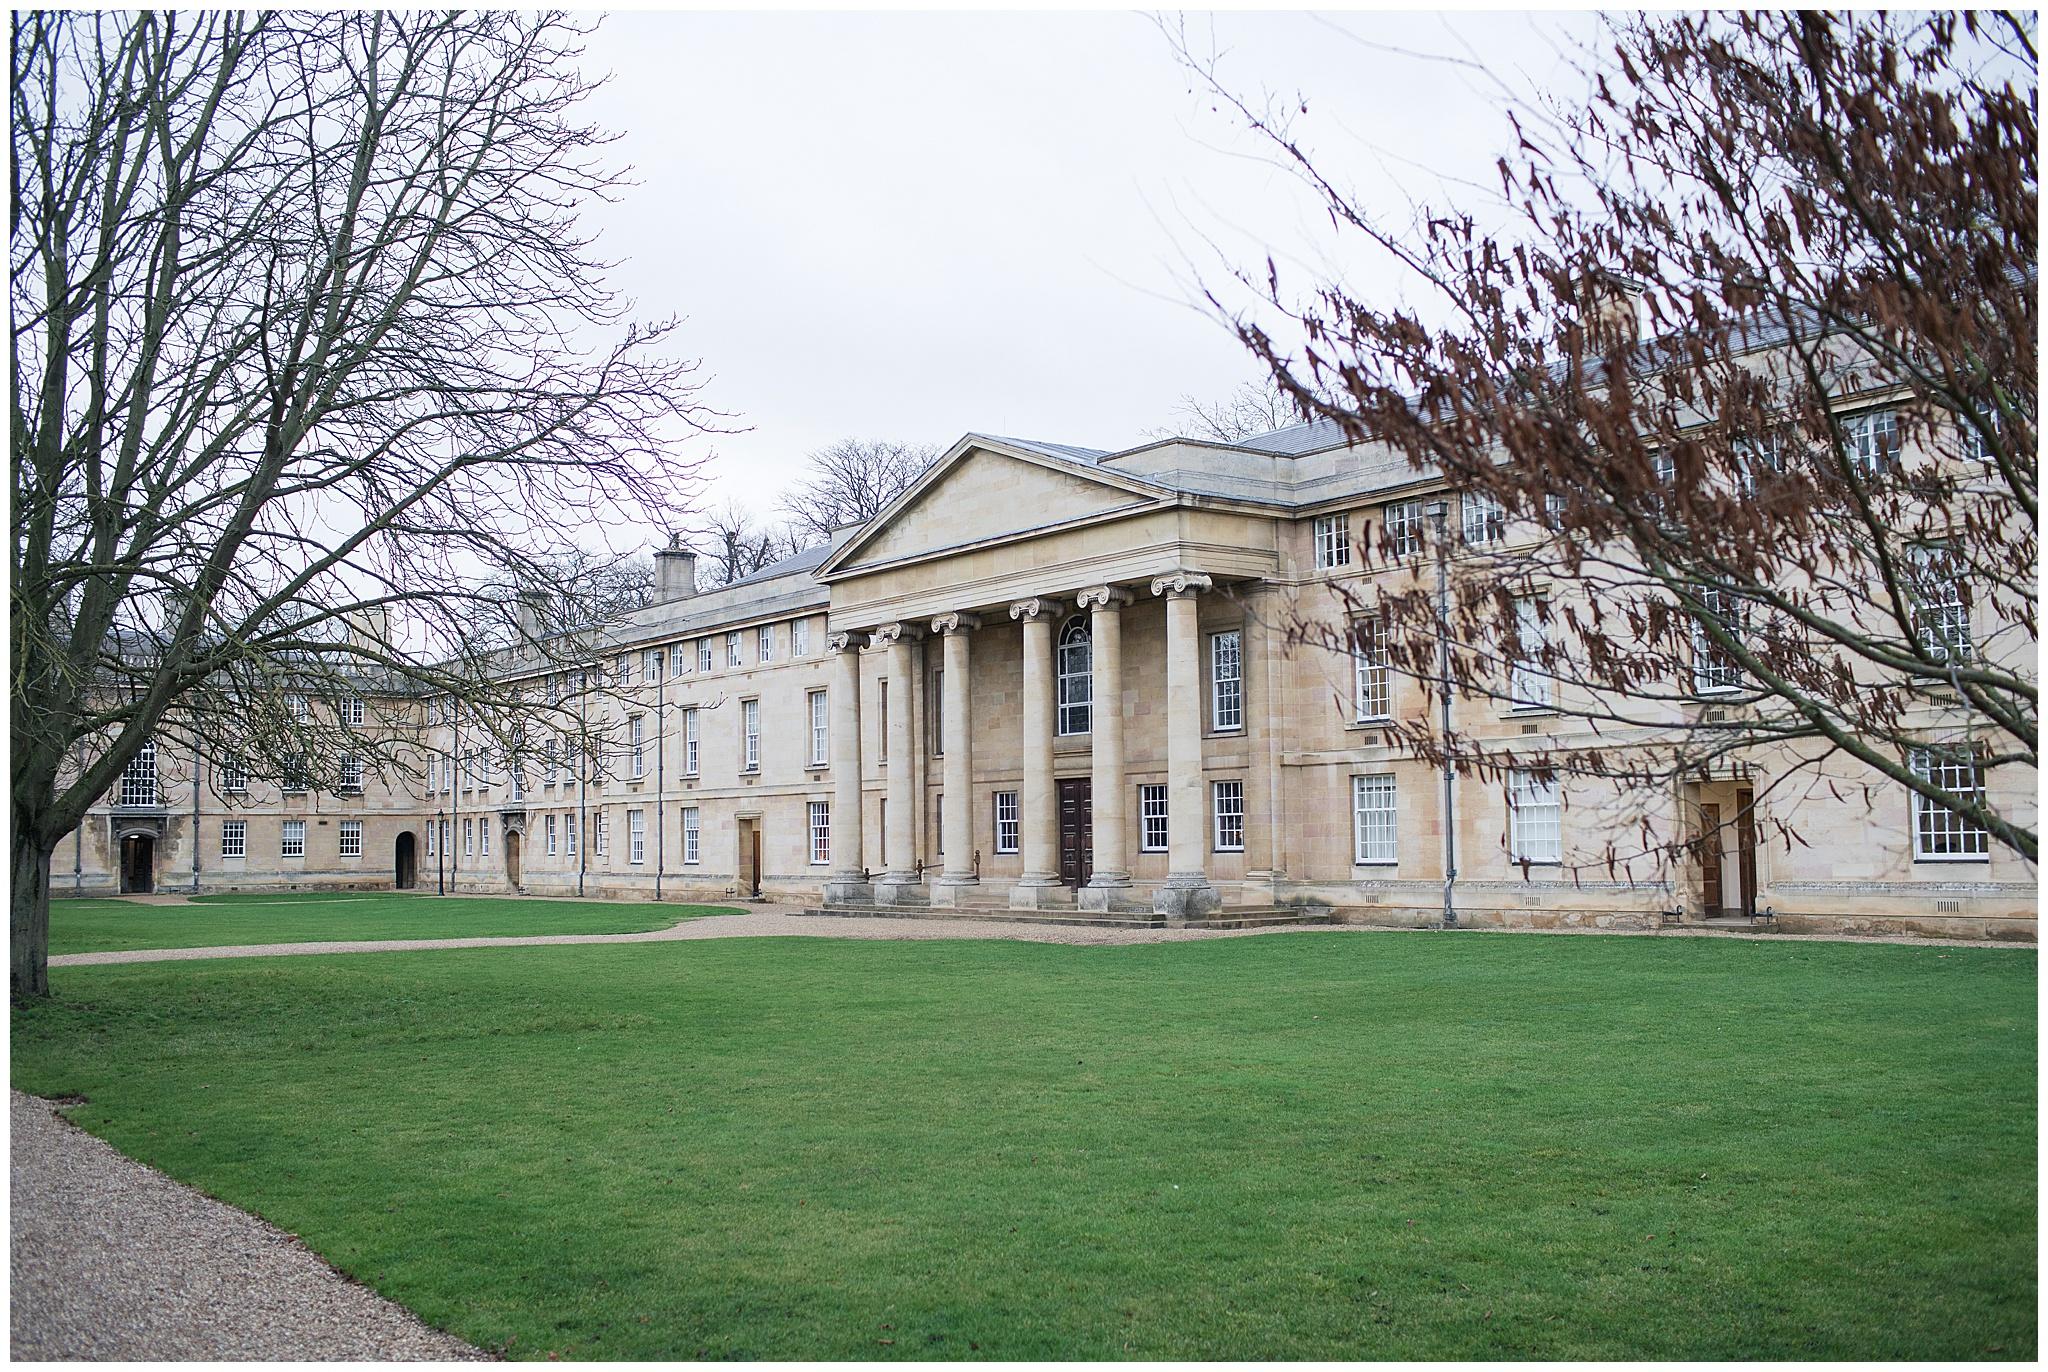 Cambridge_day1_0013.jpg